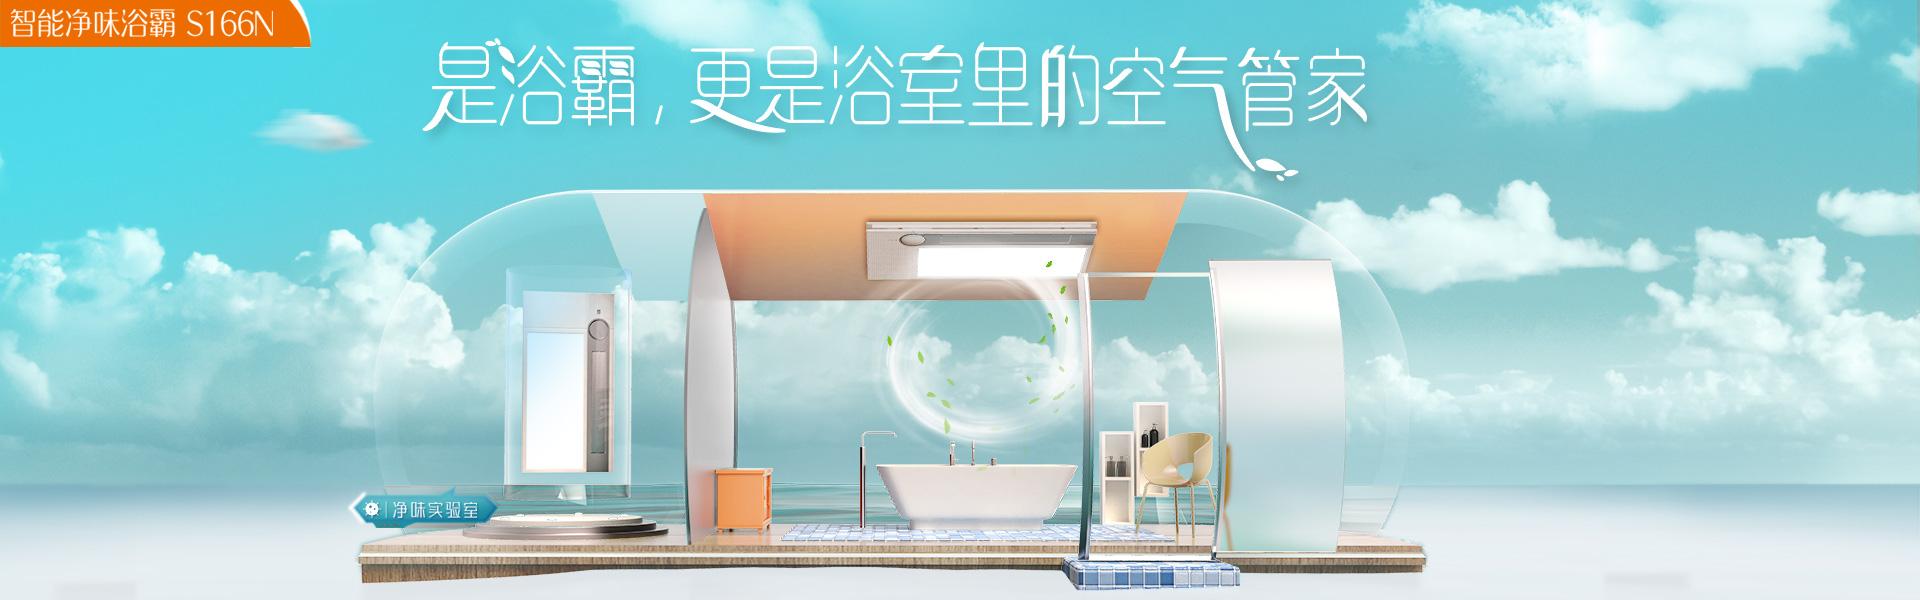 AUPU奥普官方网站-为爱设计-奥普家居股份有限公司-奥普浴霸